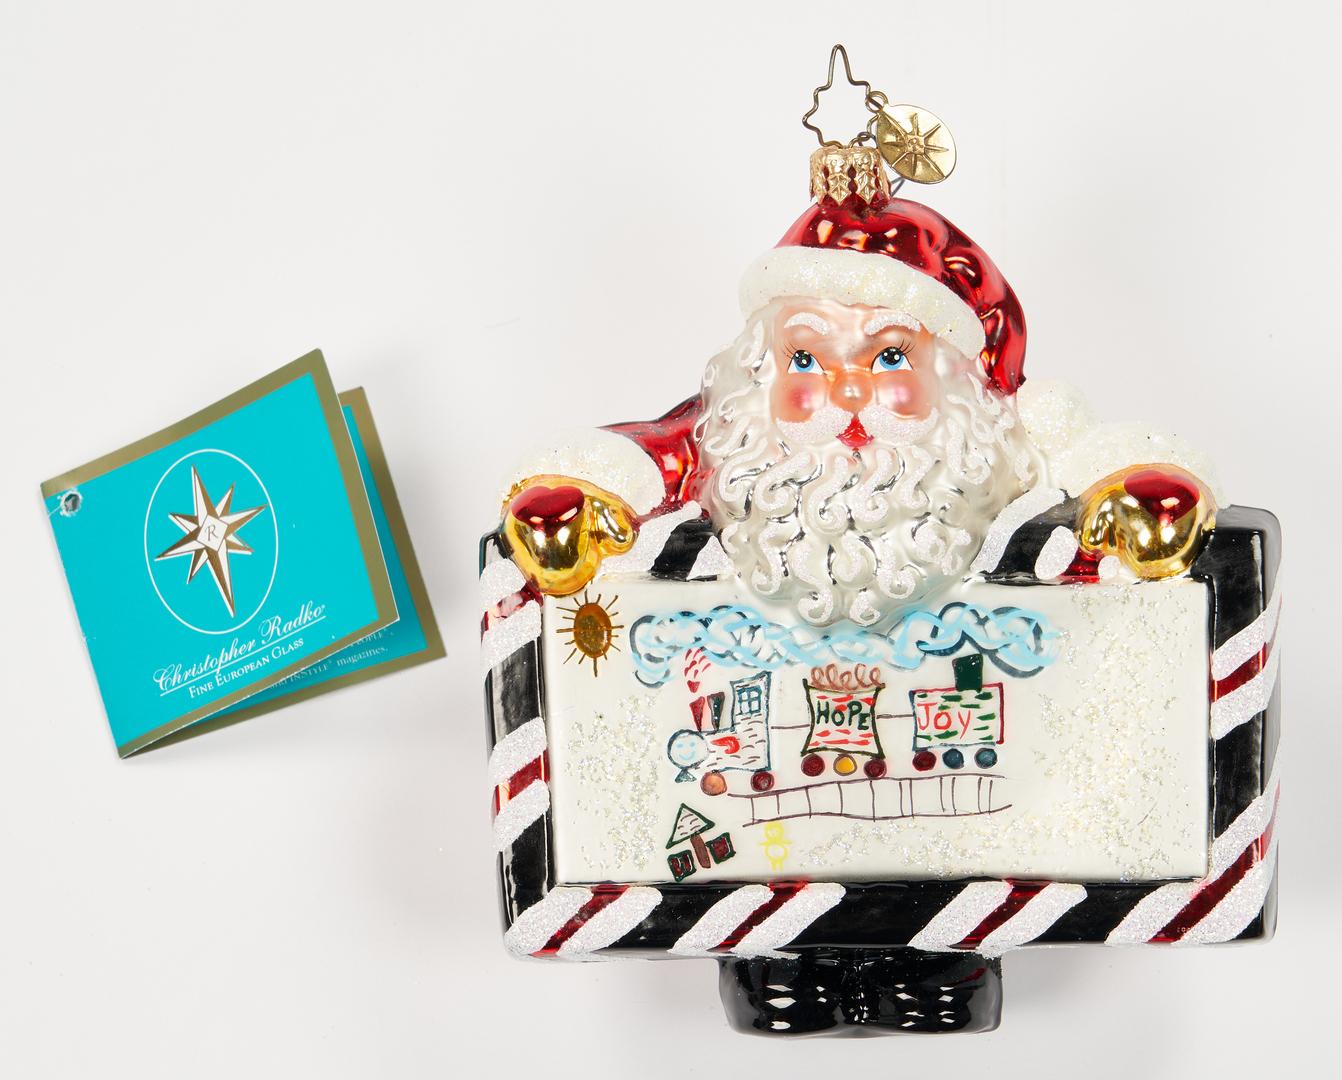 Lot 1181: 37 Christopher Radko Christmas Items, incl. Ornaments, boxed set